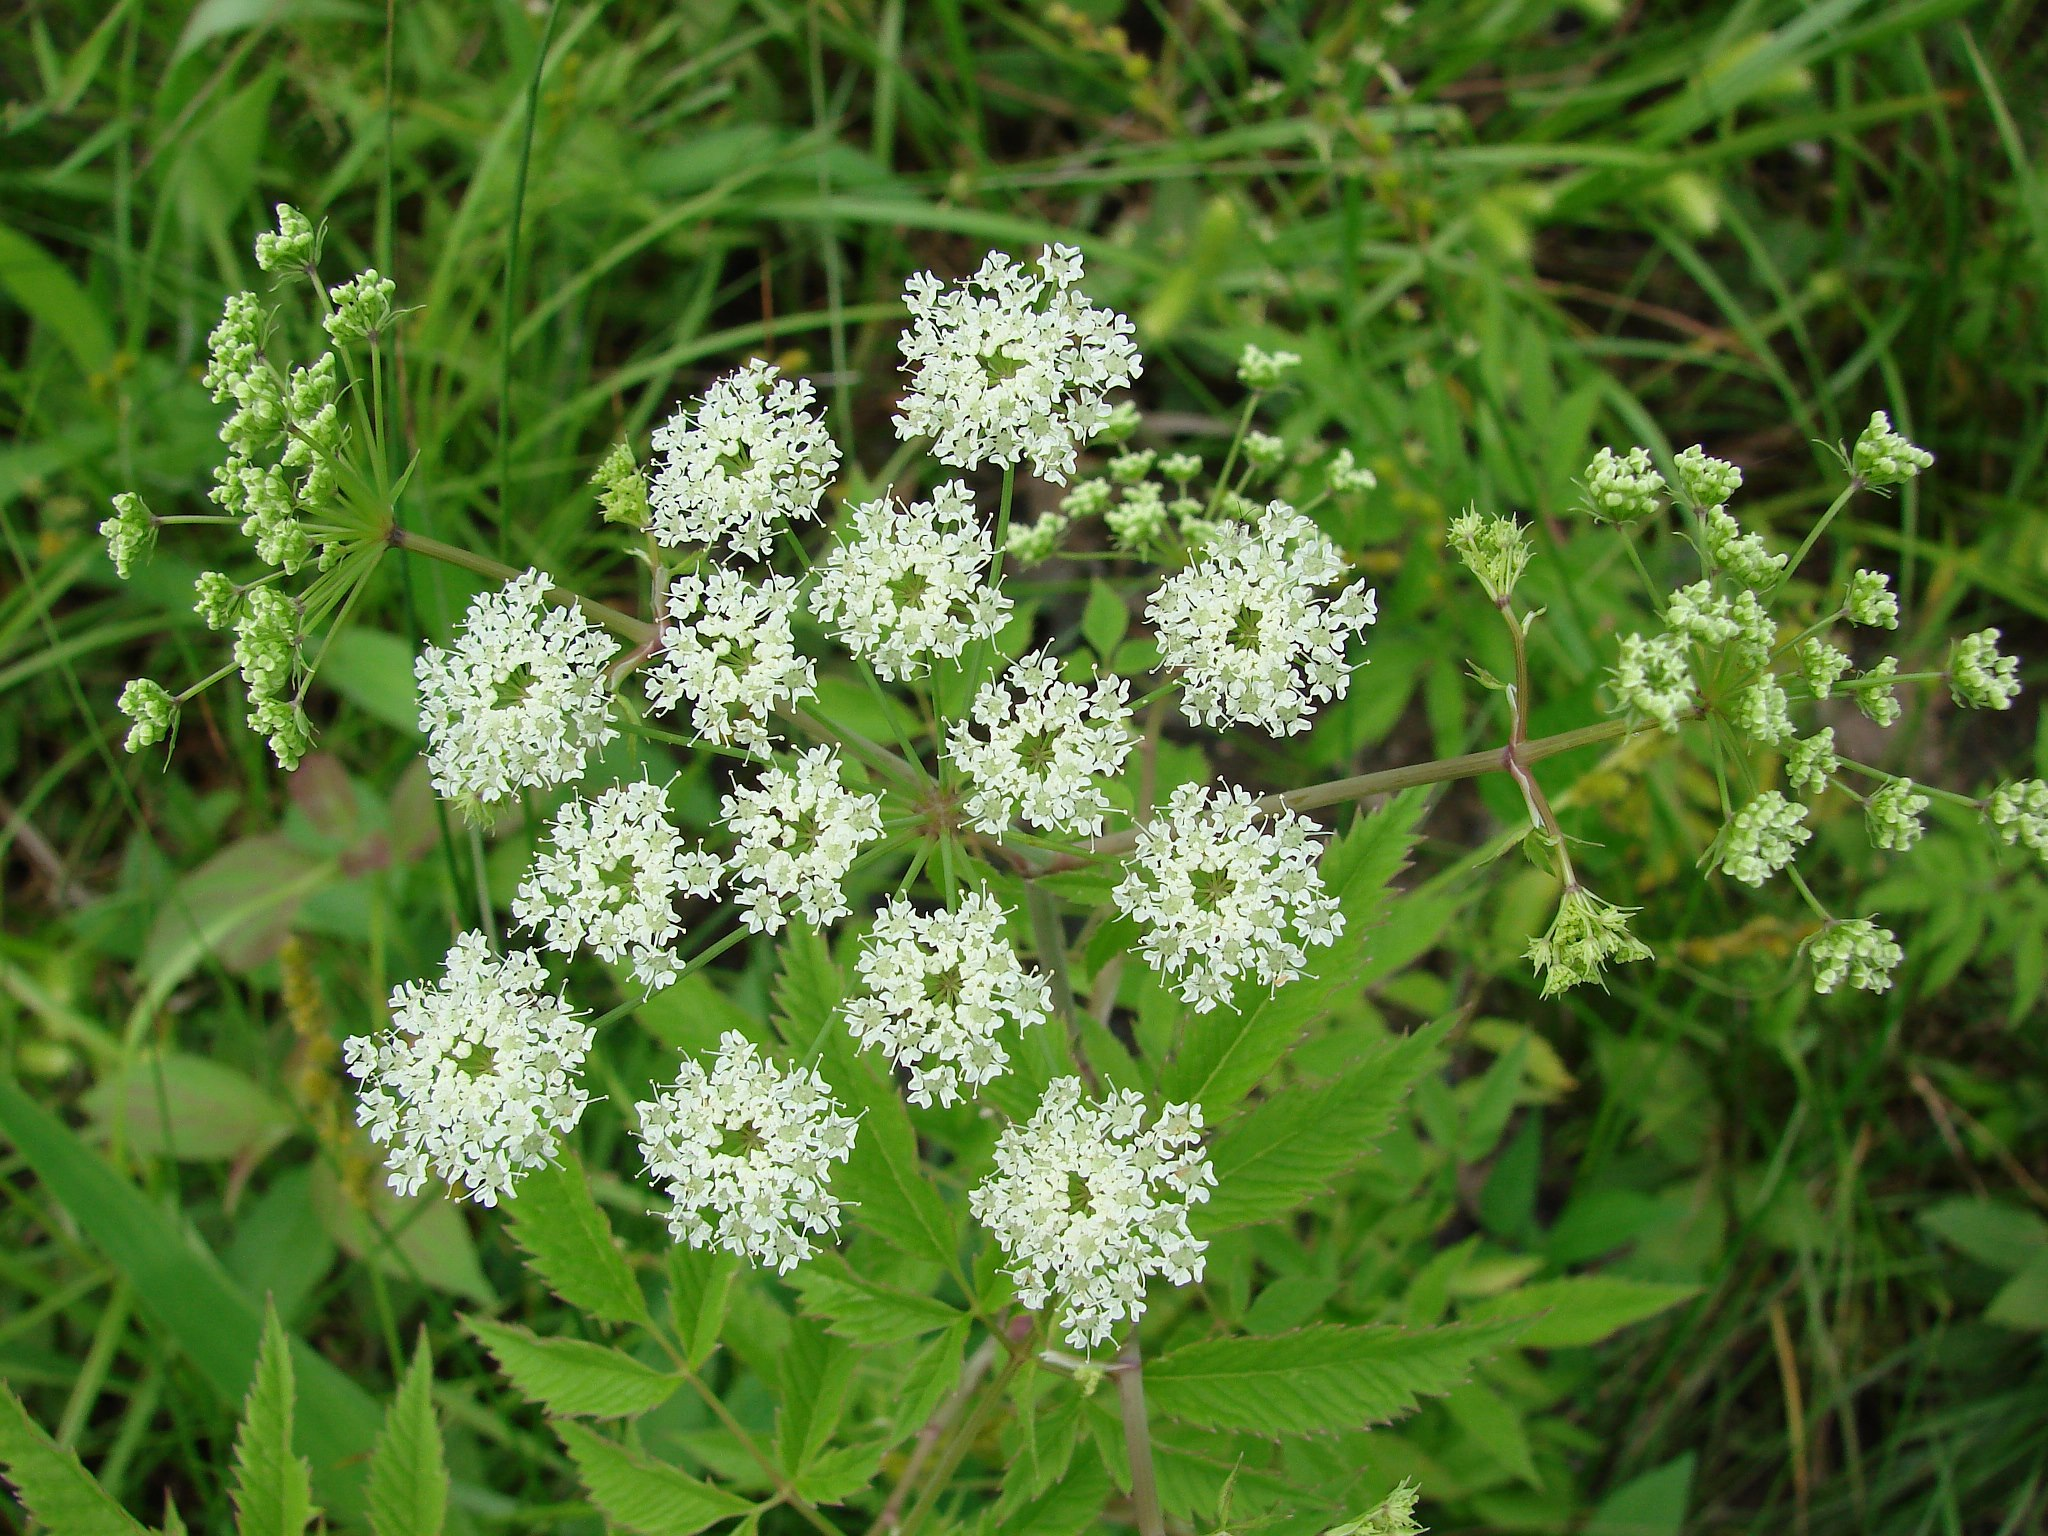 Image Related To Cicuta maculata var. maculata (Water Hemlock)